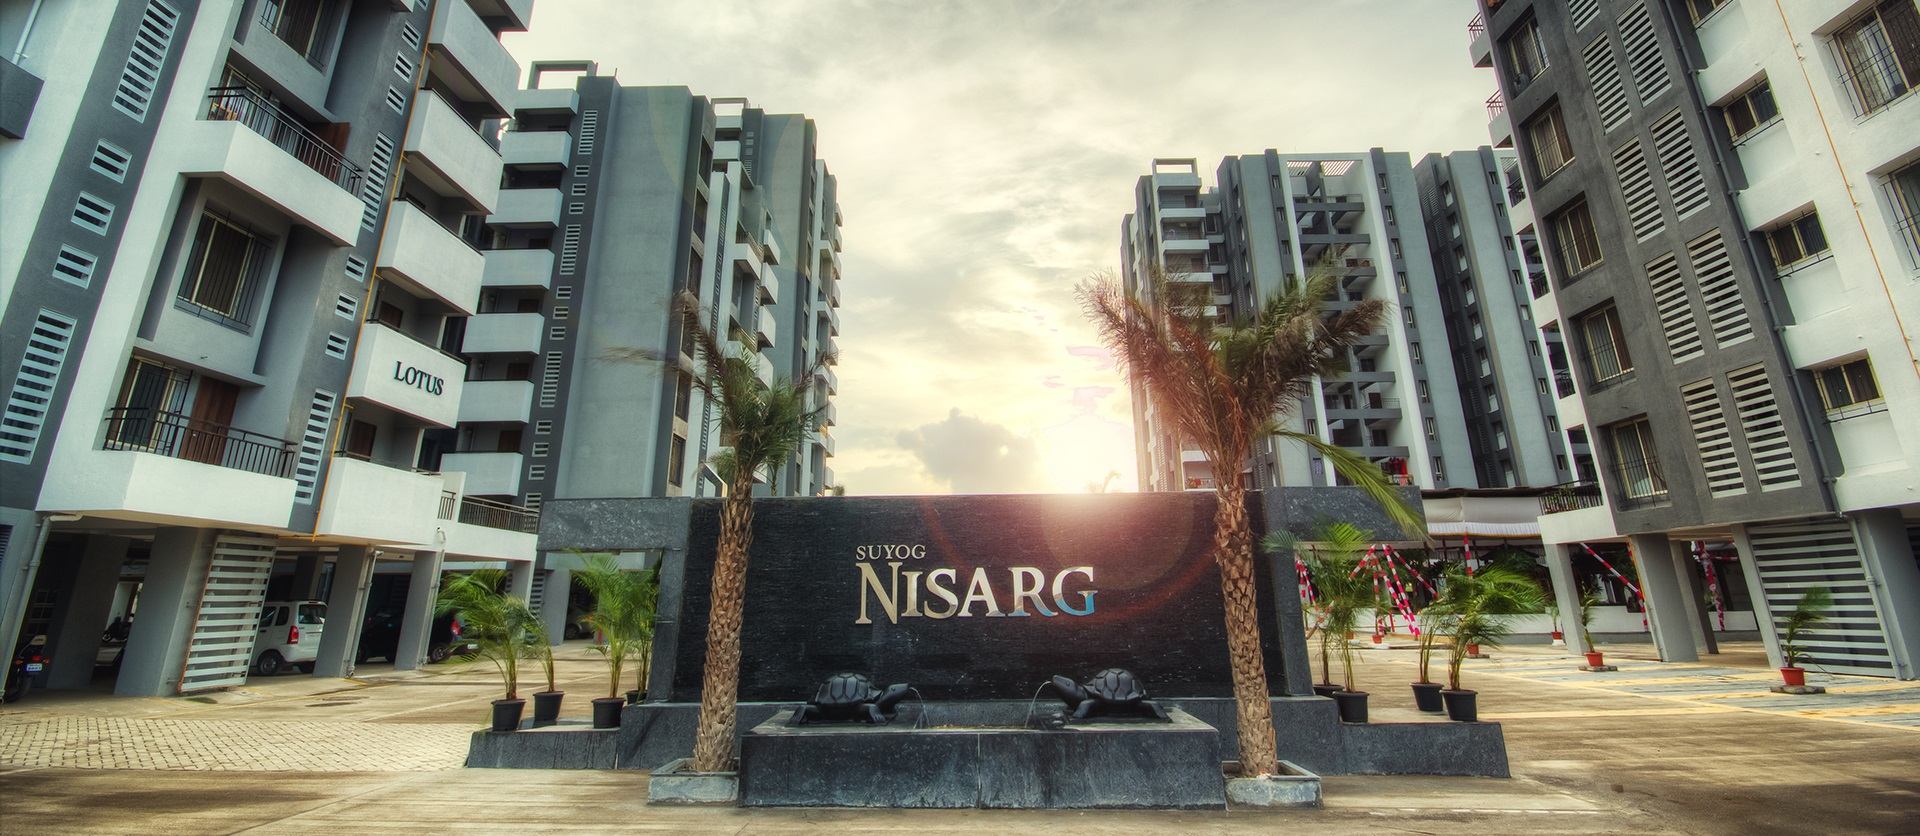 Suyog Nisarg At Wagholi In Pune By Suyog Development